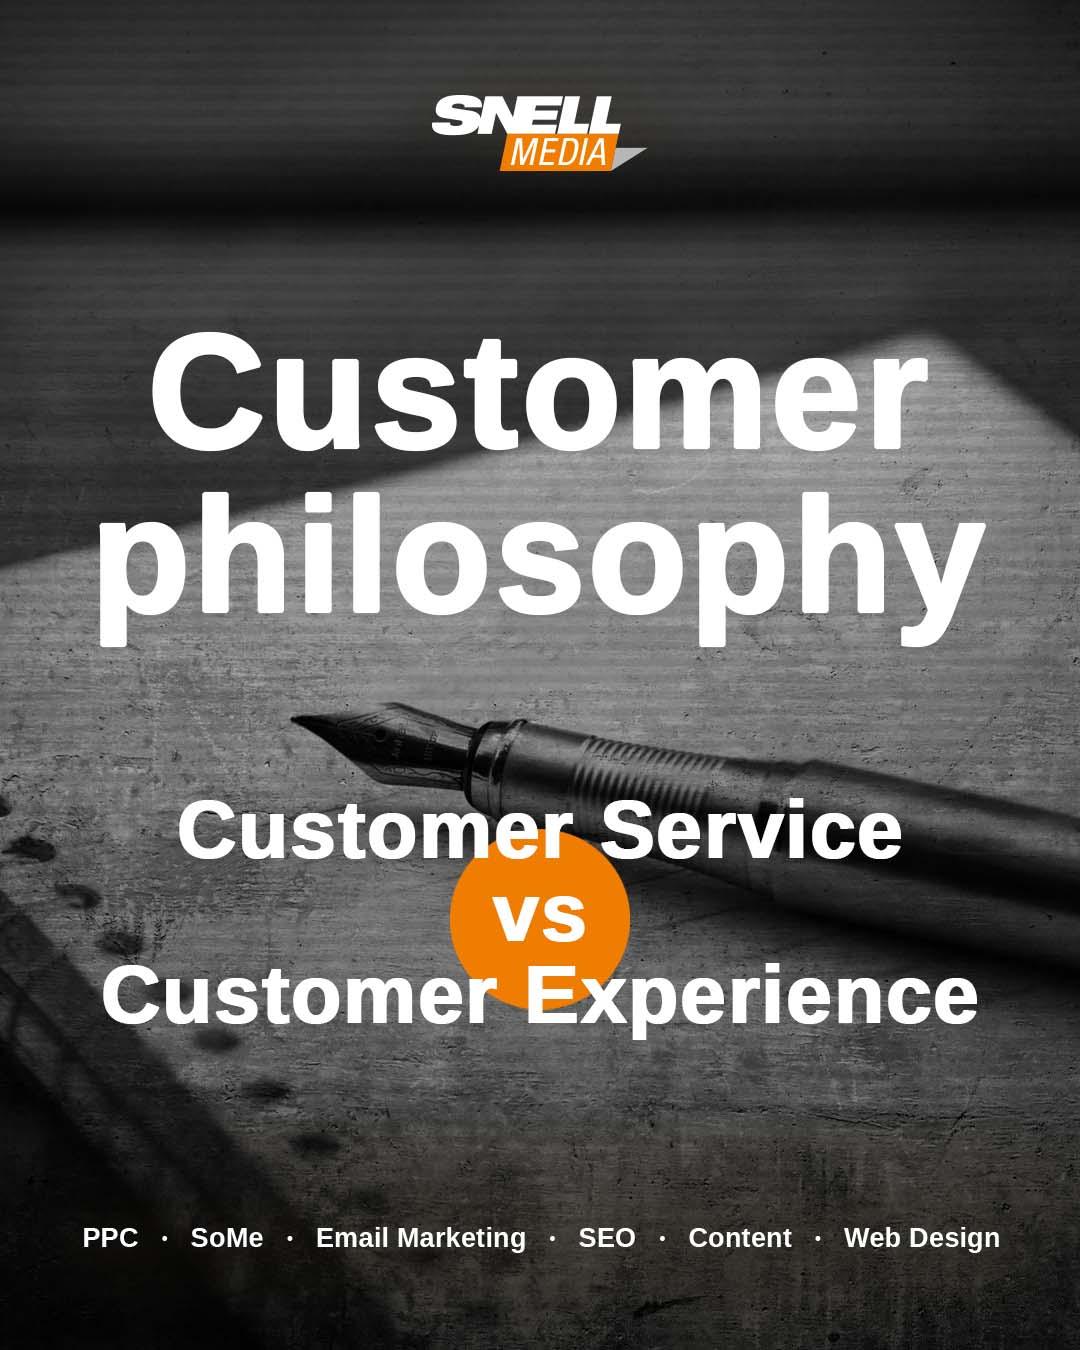 Multichannel Customer Service vs Omnichannel Customer Experience